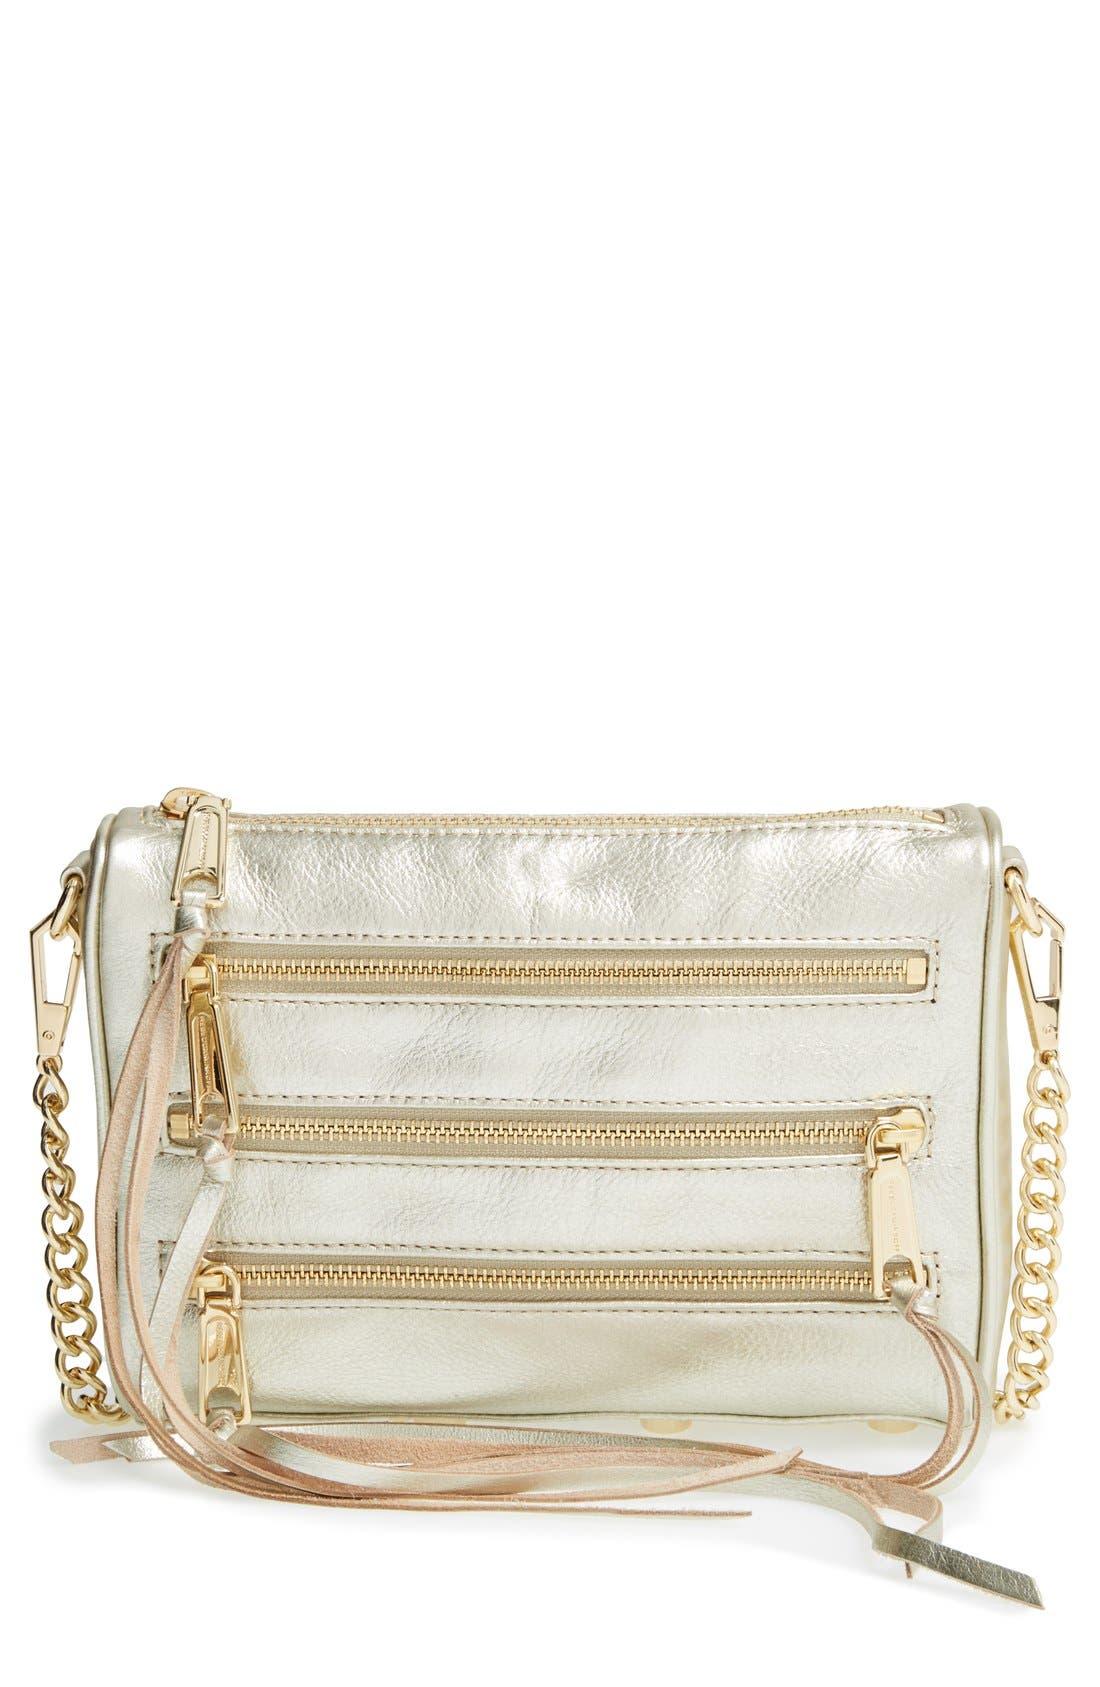 Main Image - Rebecca Minkoff 'Mini 5 Zip' Crossbody Bag